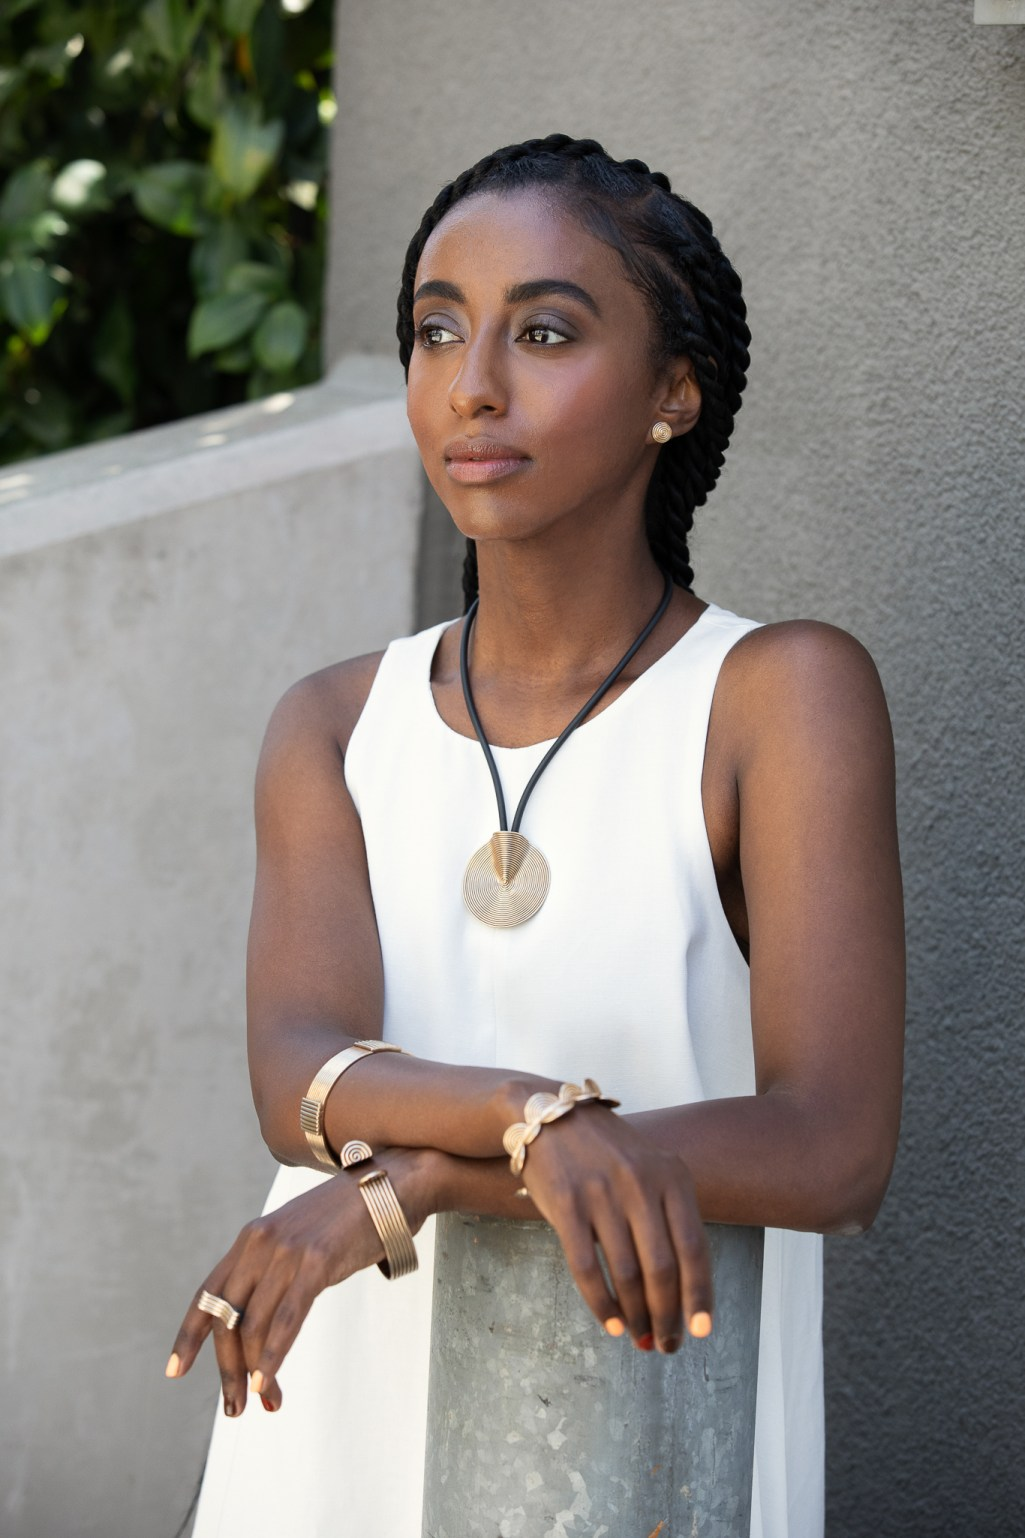 Kalkidan Gebreyohannes models for Elina Peduzzi Jewelry lookbook photoshoot in Oakland CA